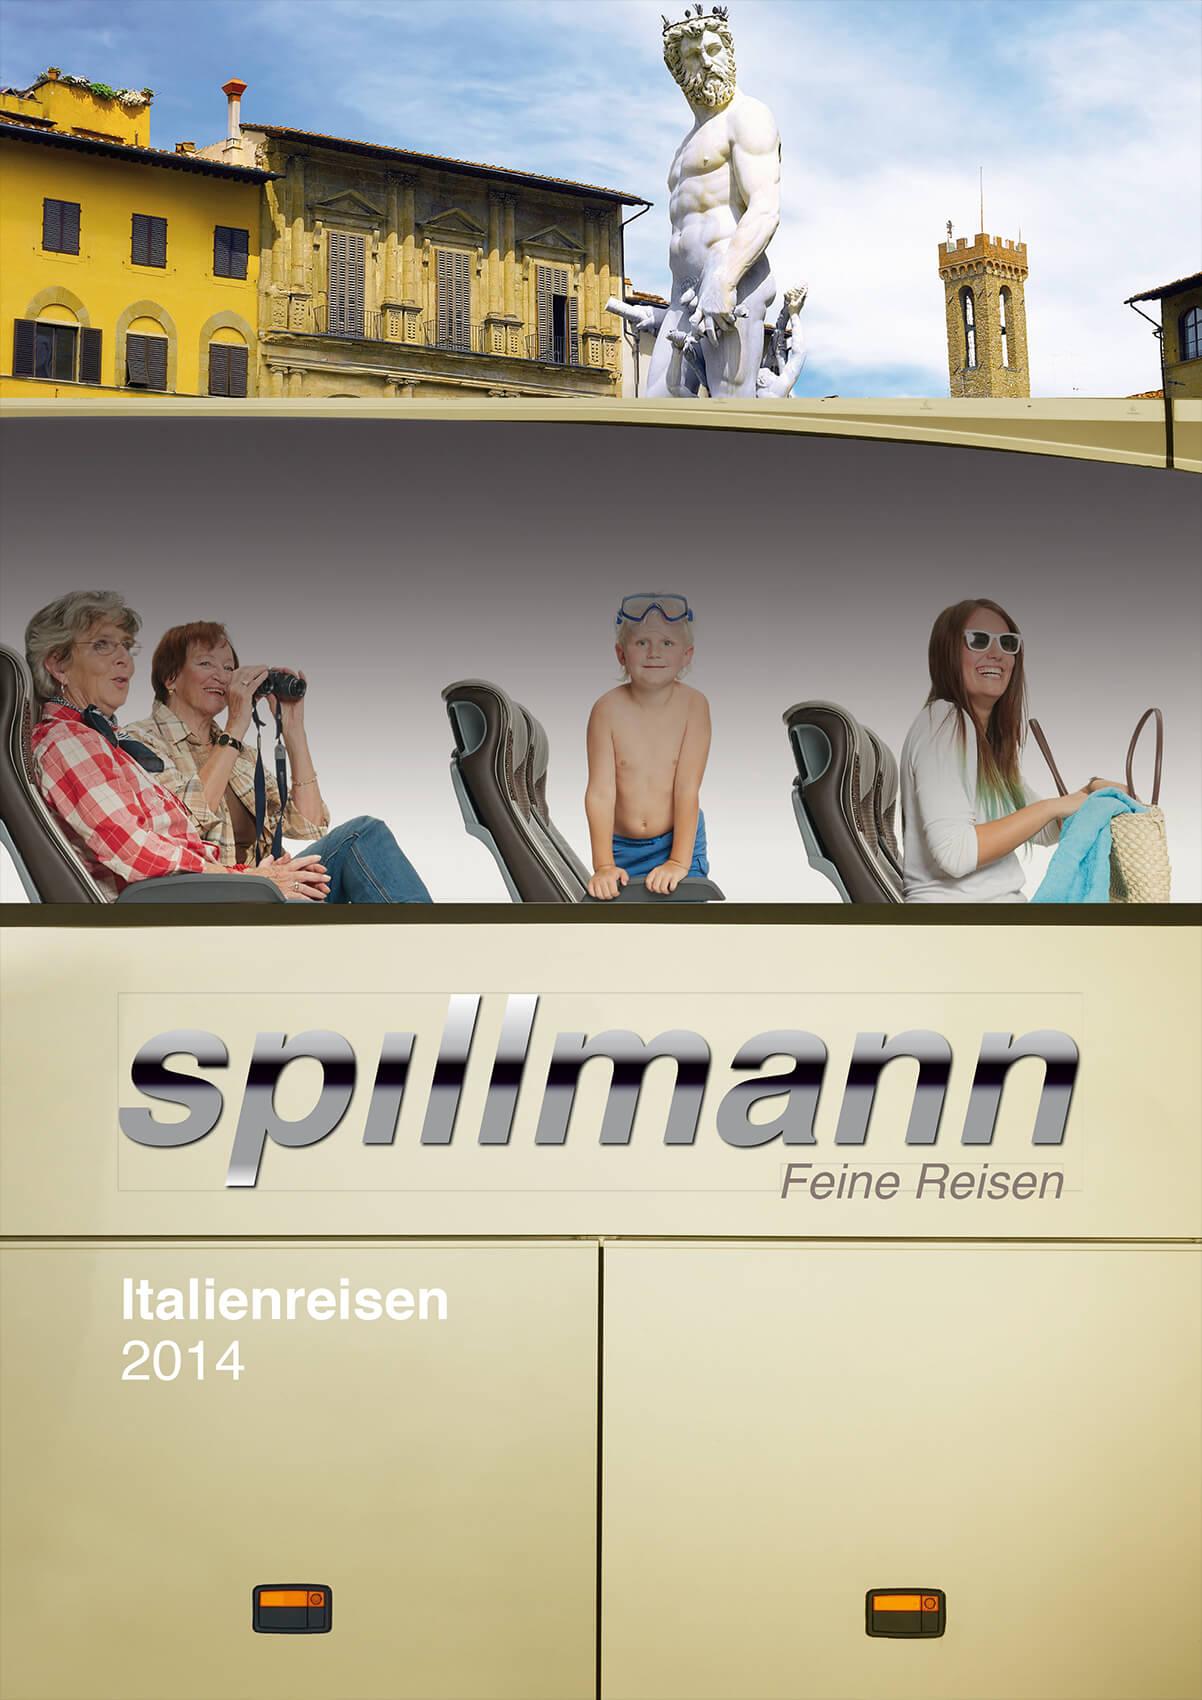 italien-reisekatalog-spillmann-agentur-intermar-corporate.jpg